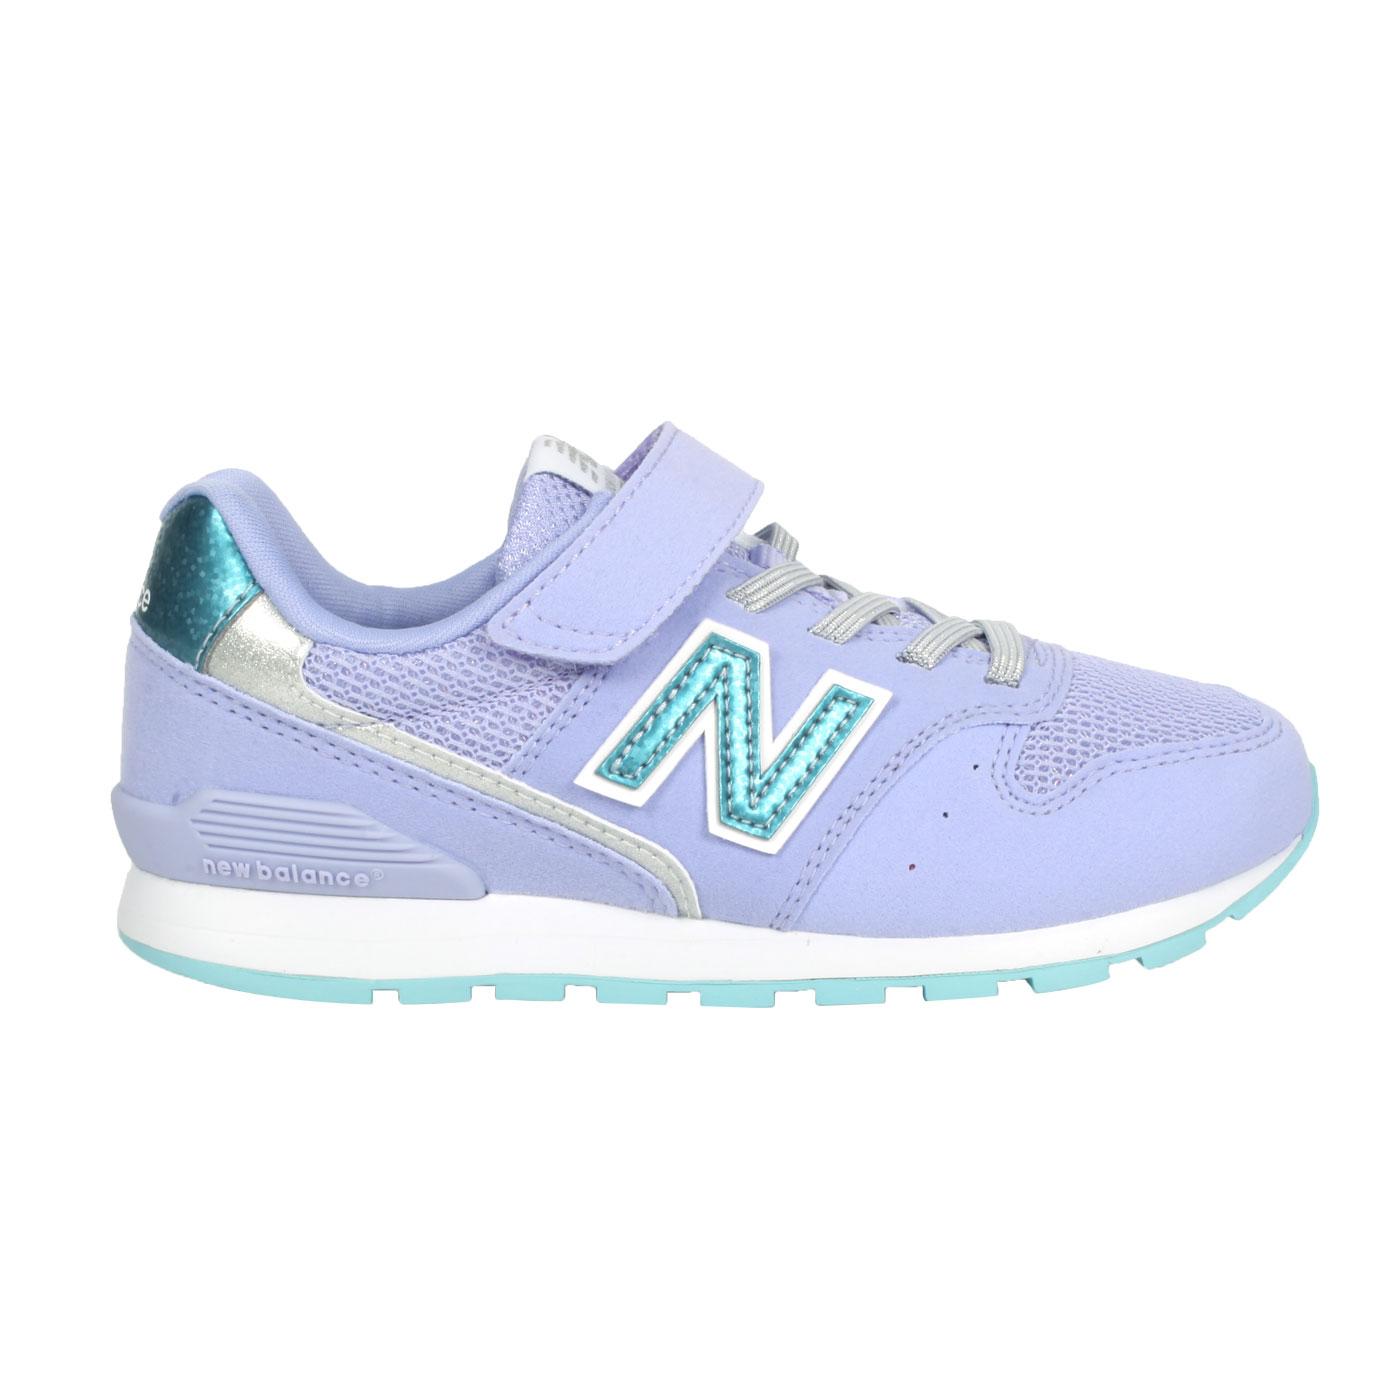 NEW BALANCE 中童休閒運動鞋-WIDE YV996ULV